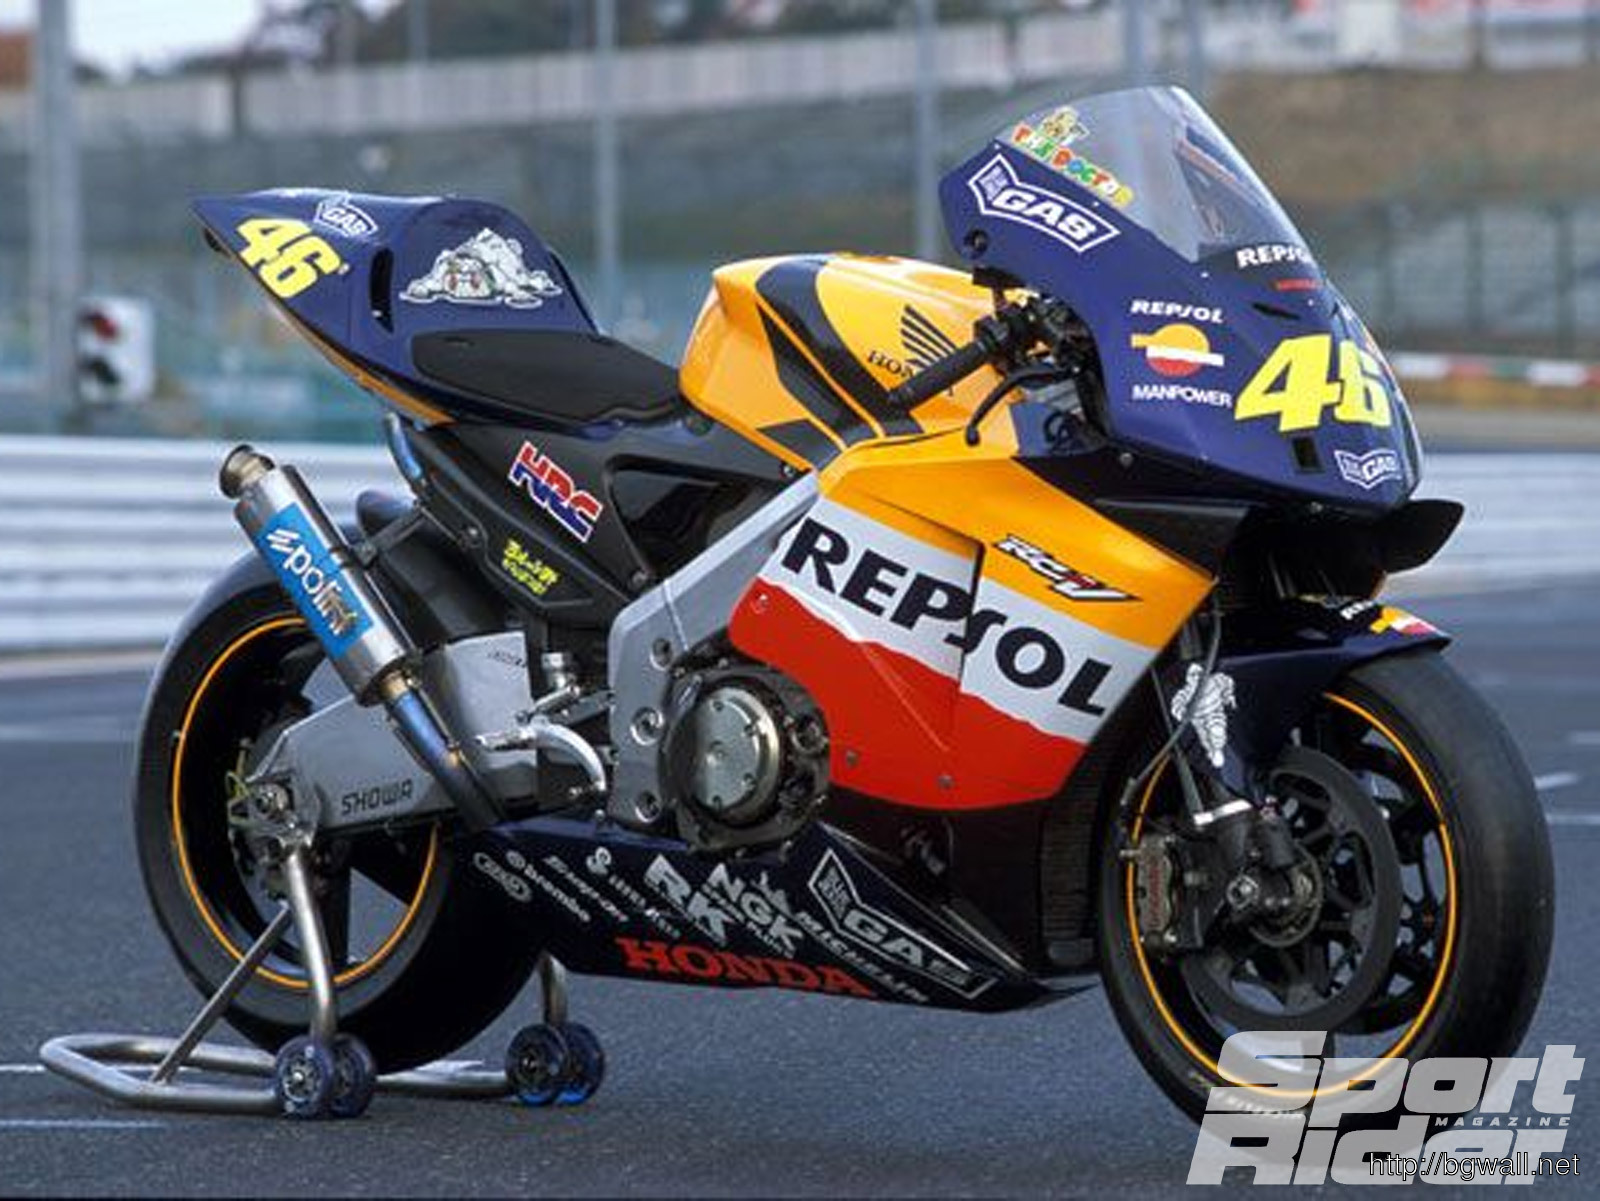 2003 Honda Rc211v 2003 Honda Rc211v Erik Buell Racing Officially Full Size